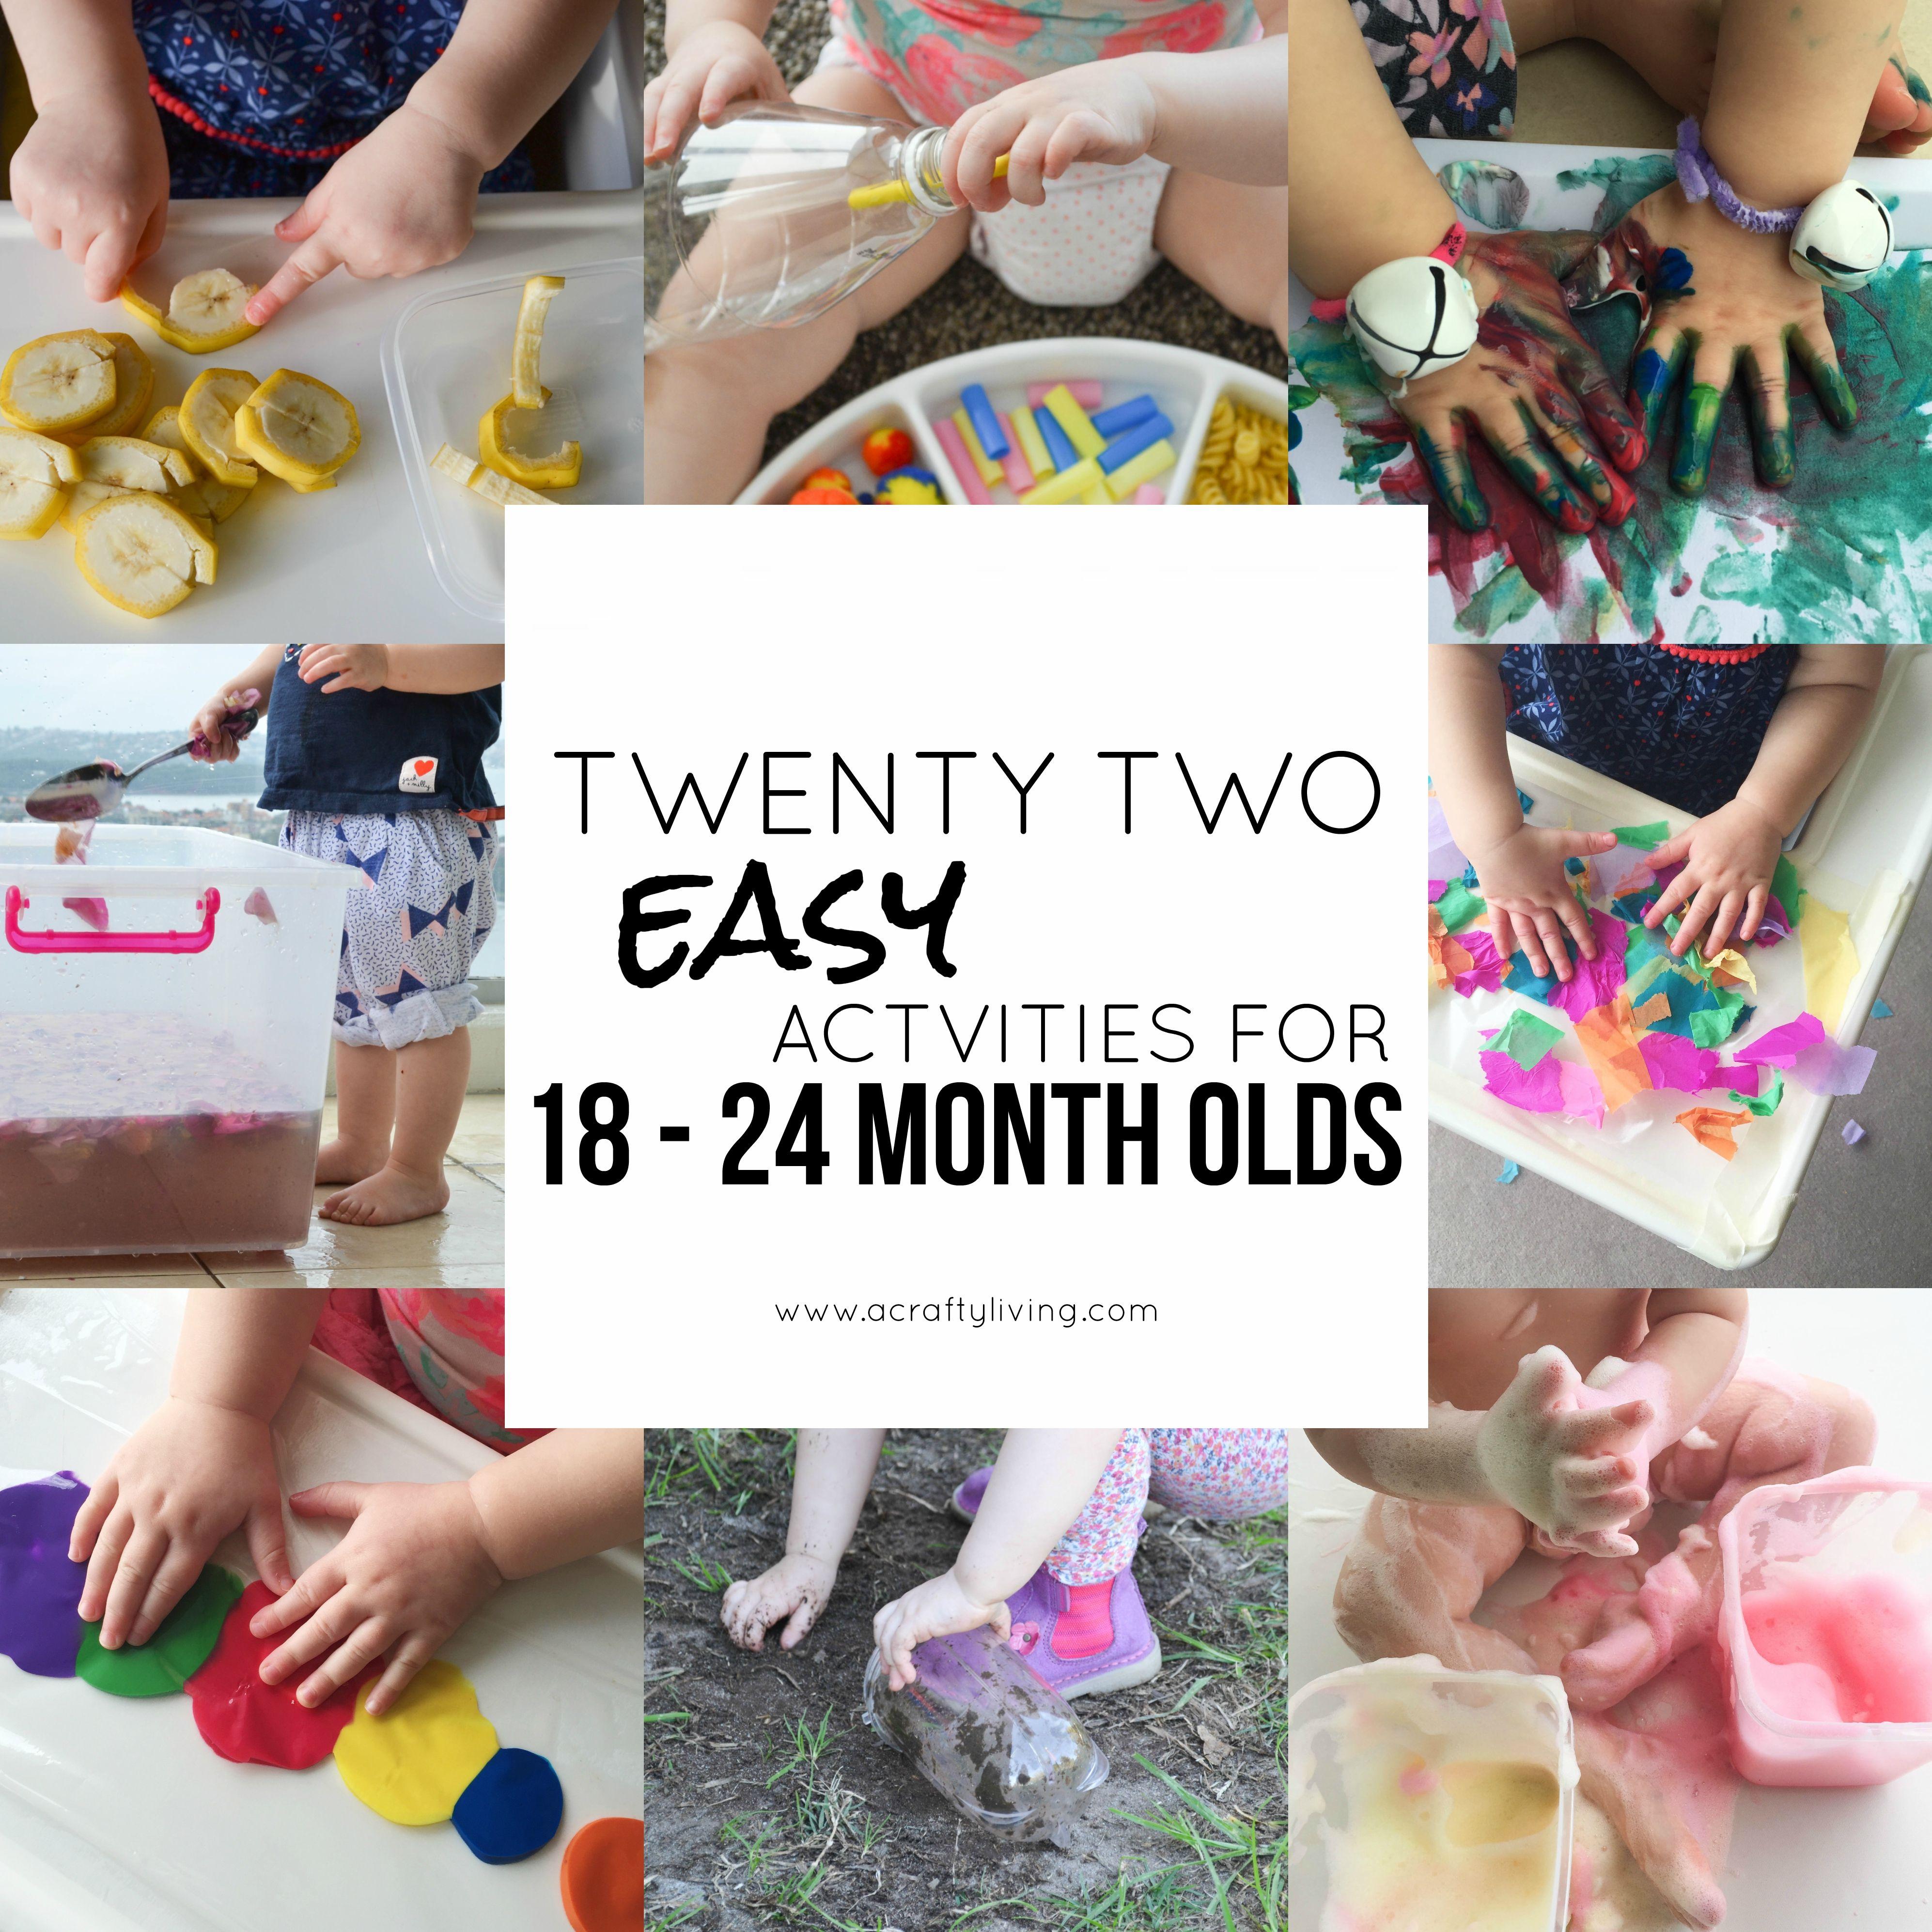 22 Easy Activities For 18